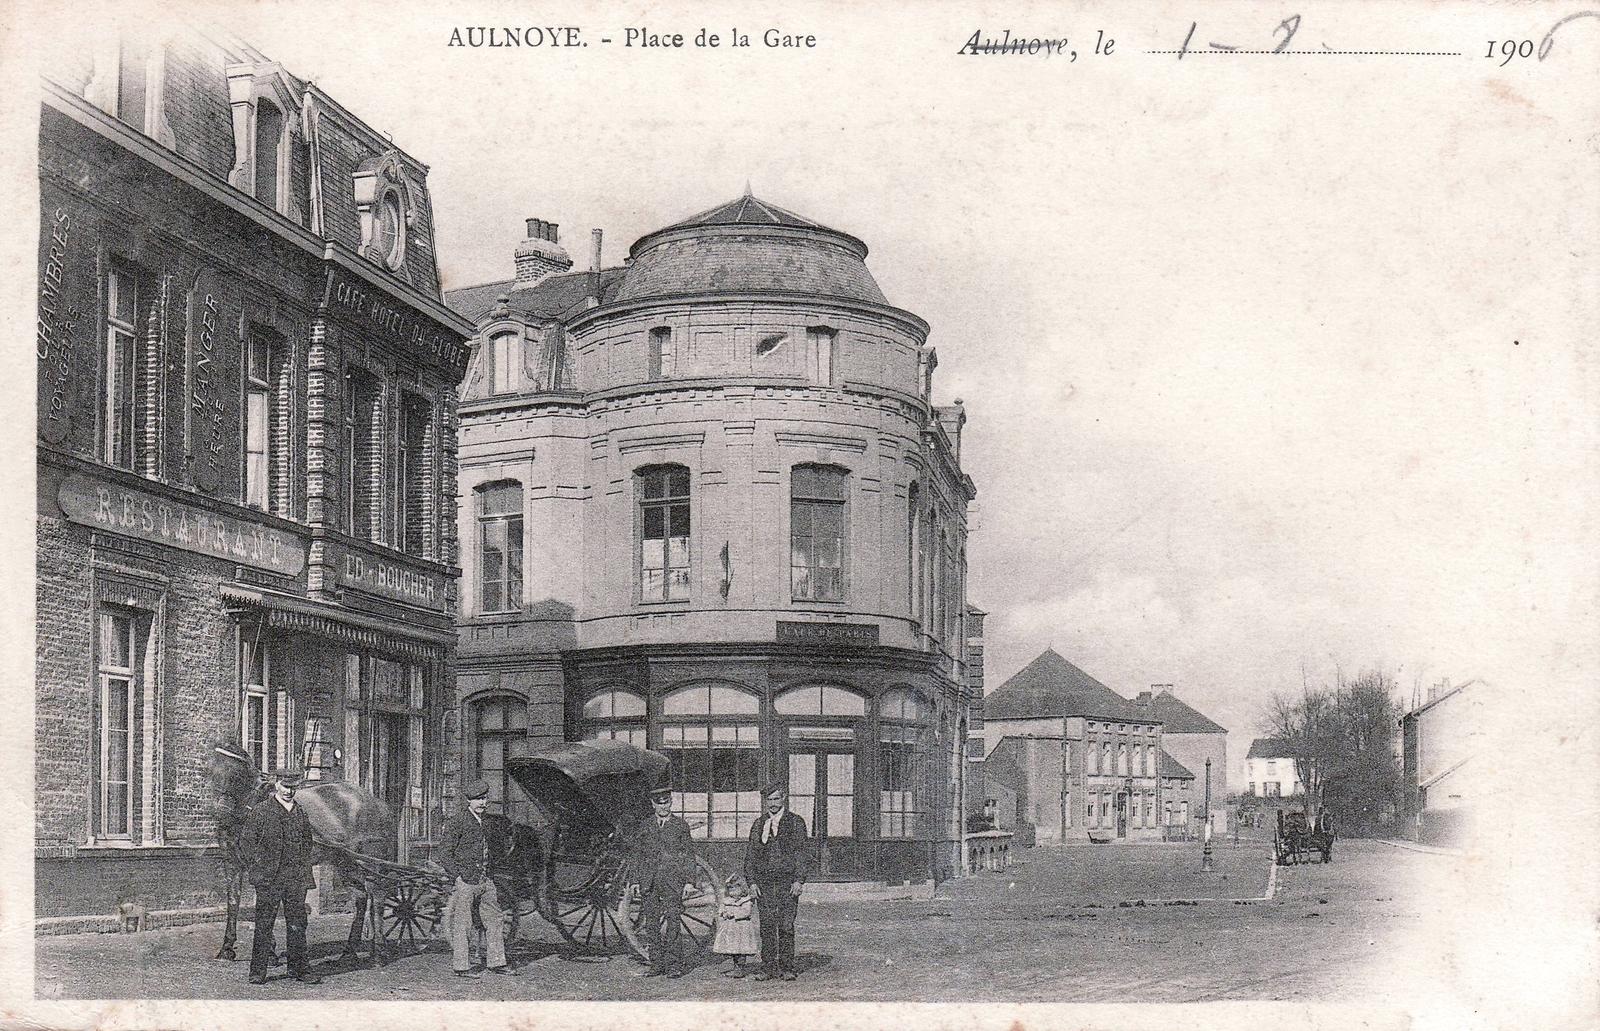 Ville D'aulnoye-Aymeries, La Mairie D'aulnoye-Aymeries Et Sa ... tout Piscine Aulnoye Aymeries